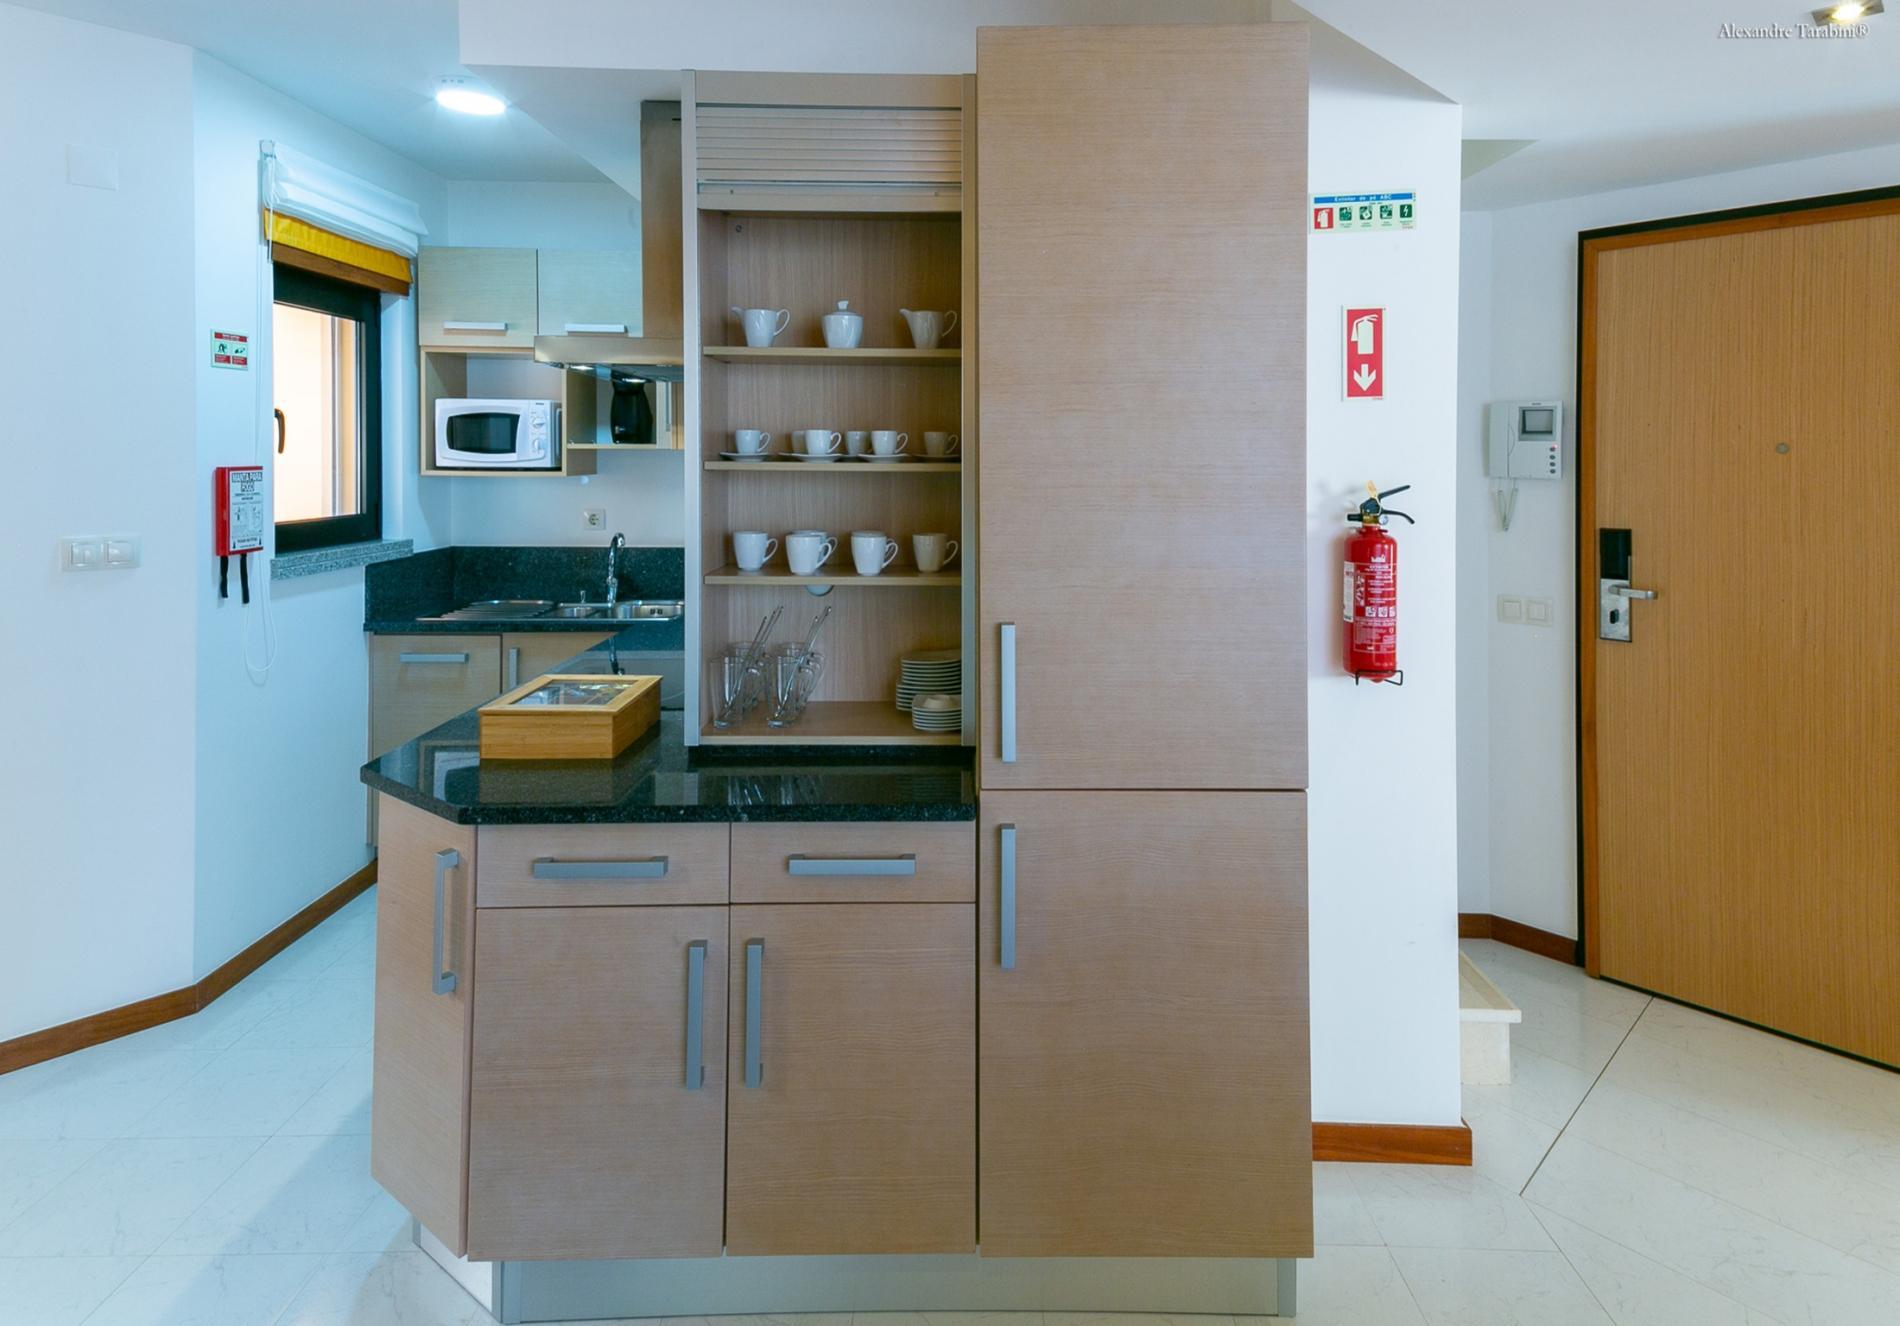 Ferienwohnung A24 - LuzBay Beach Apartment (2558091), Luz, , Algarve, Portugal, Bild 6